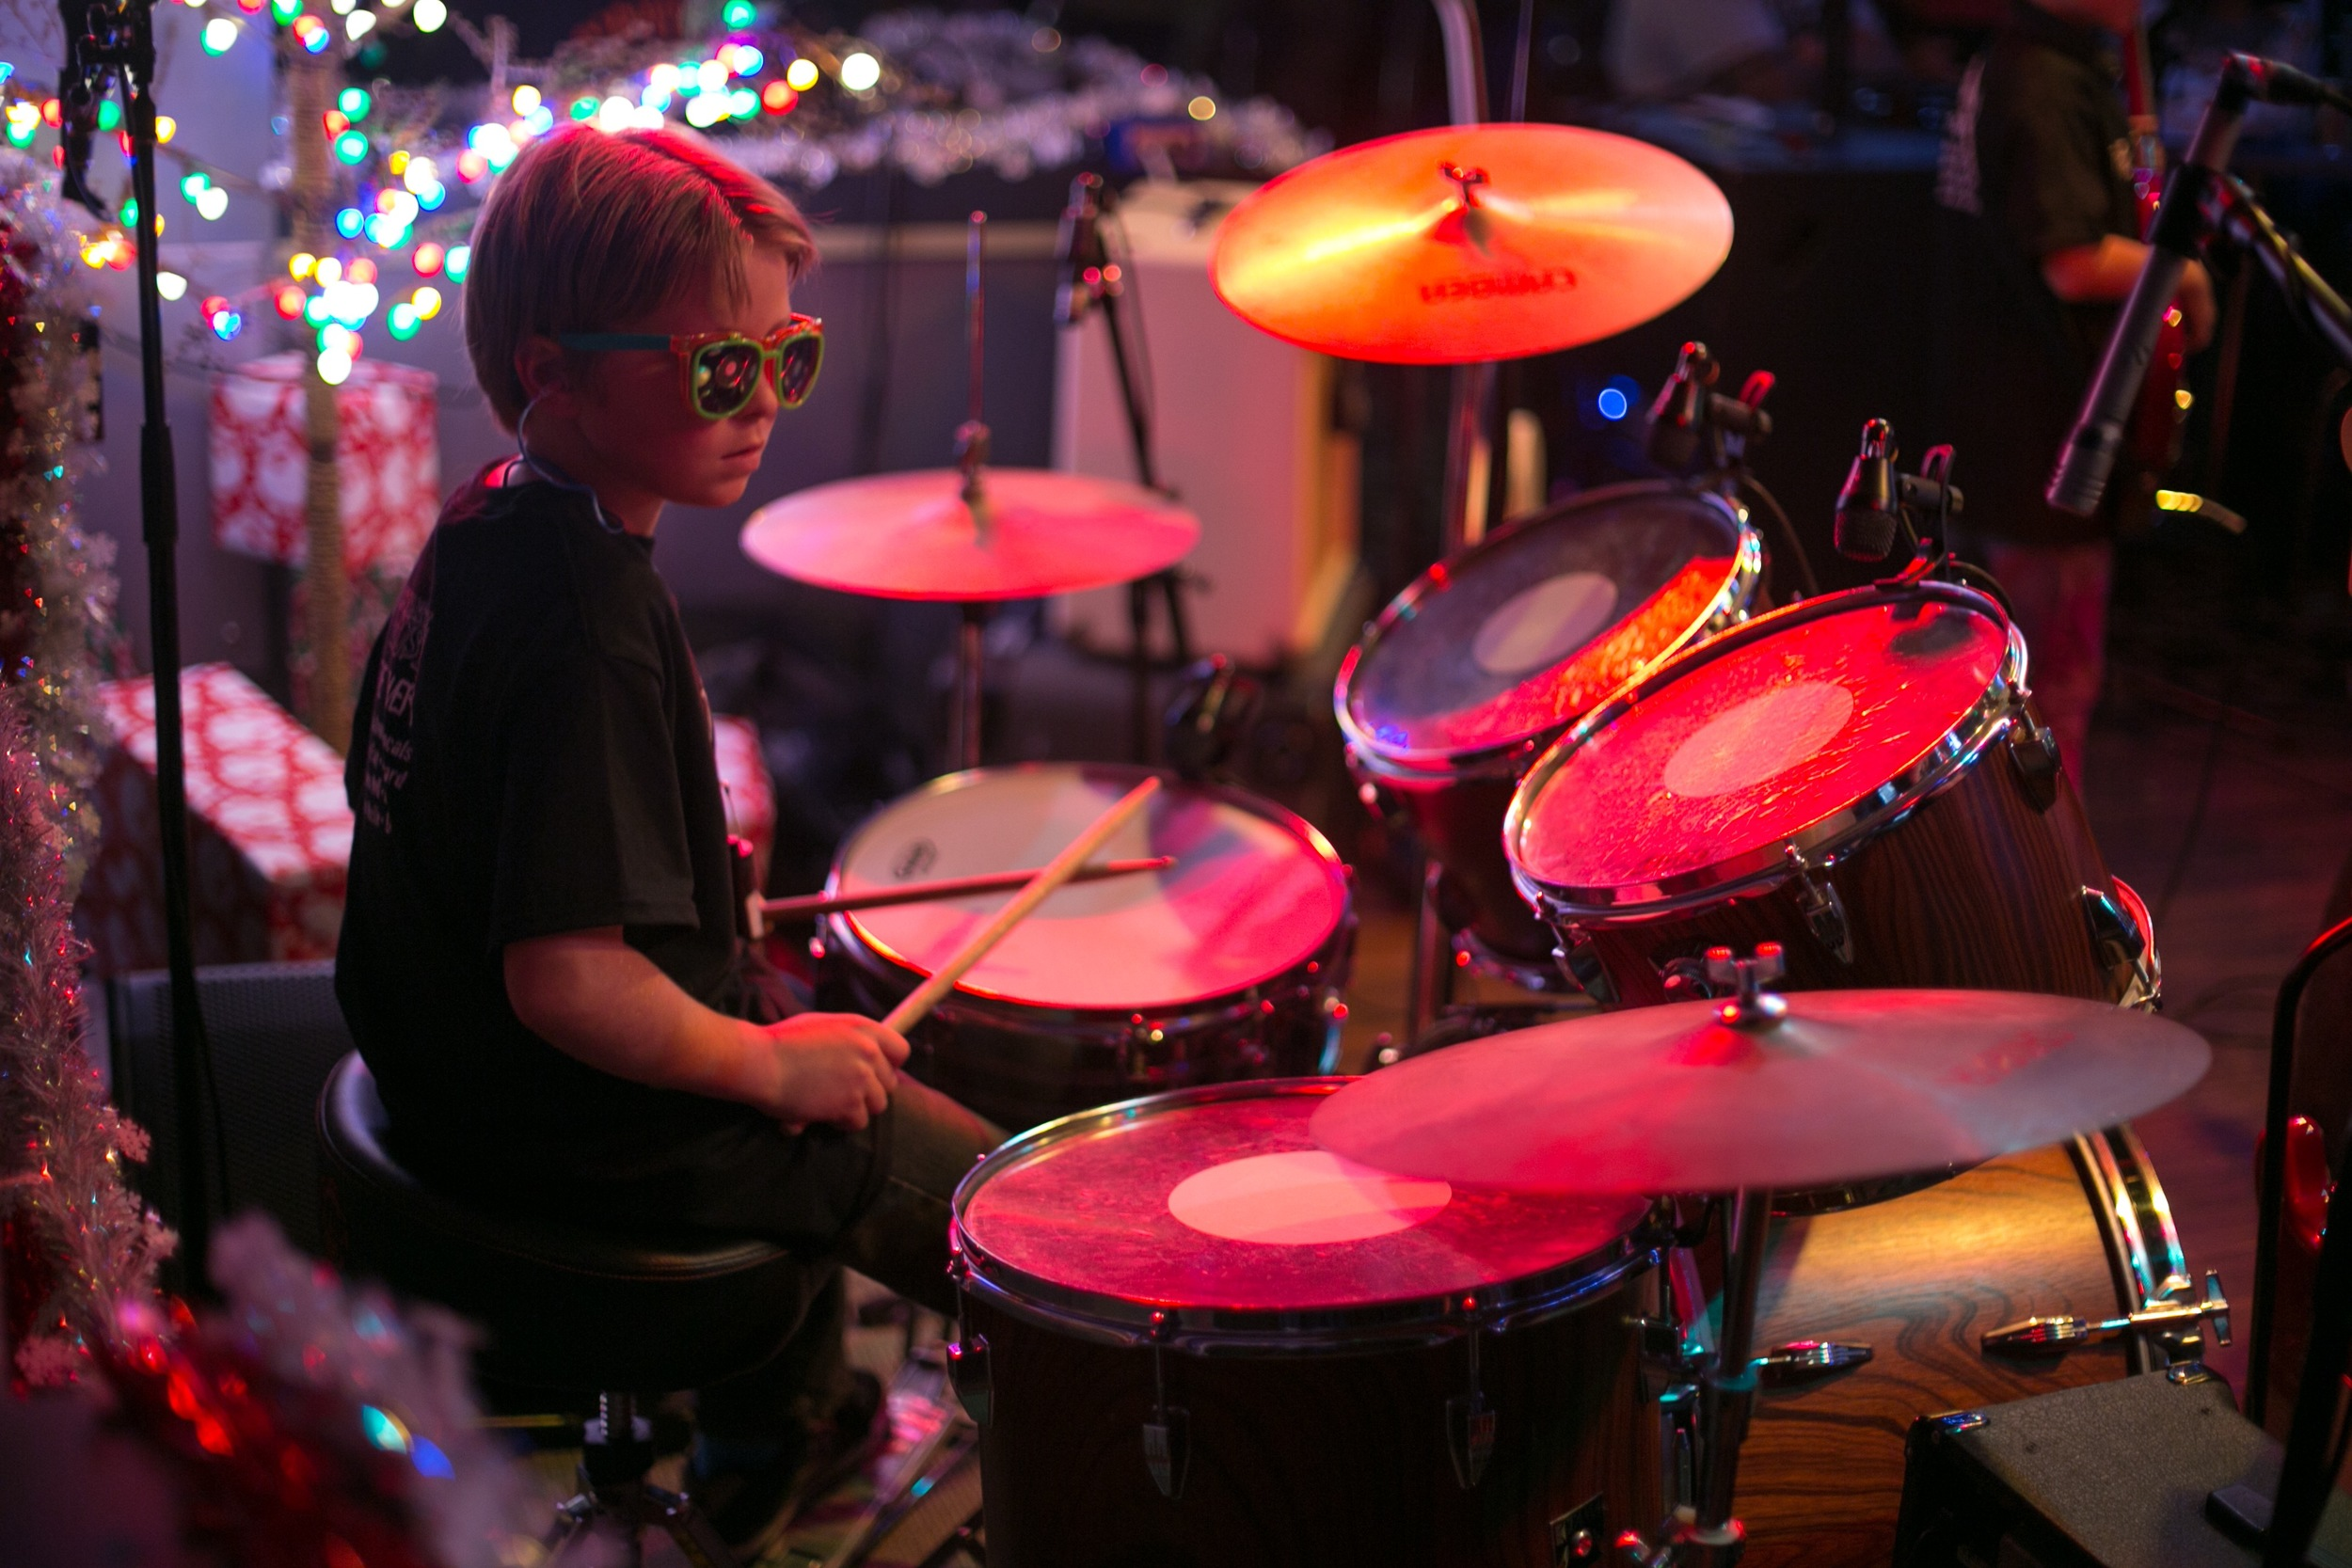 Jaxson, drummer for The Twerps